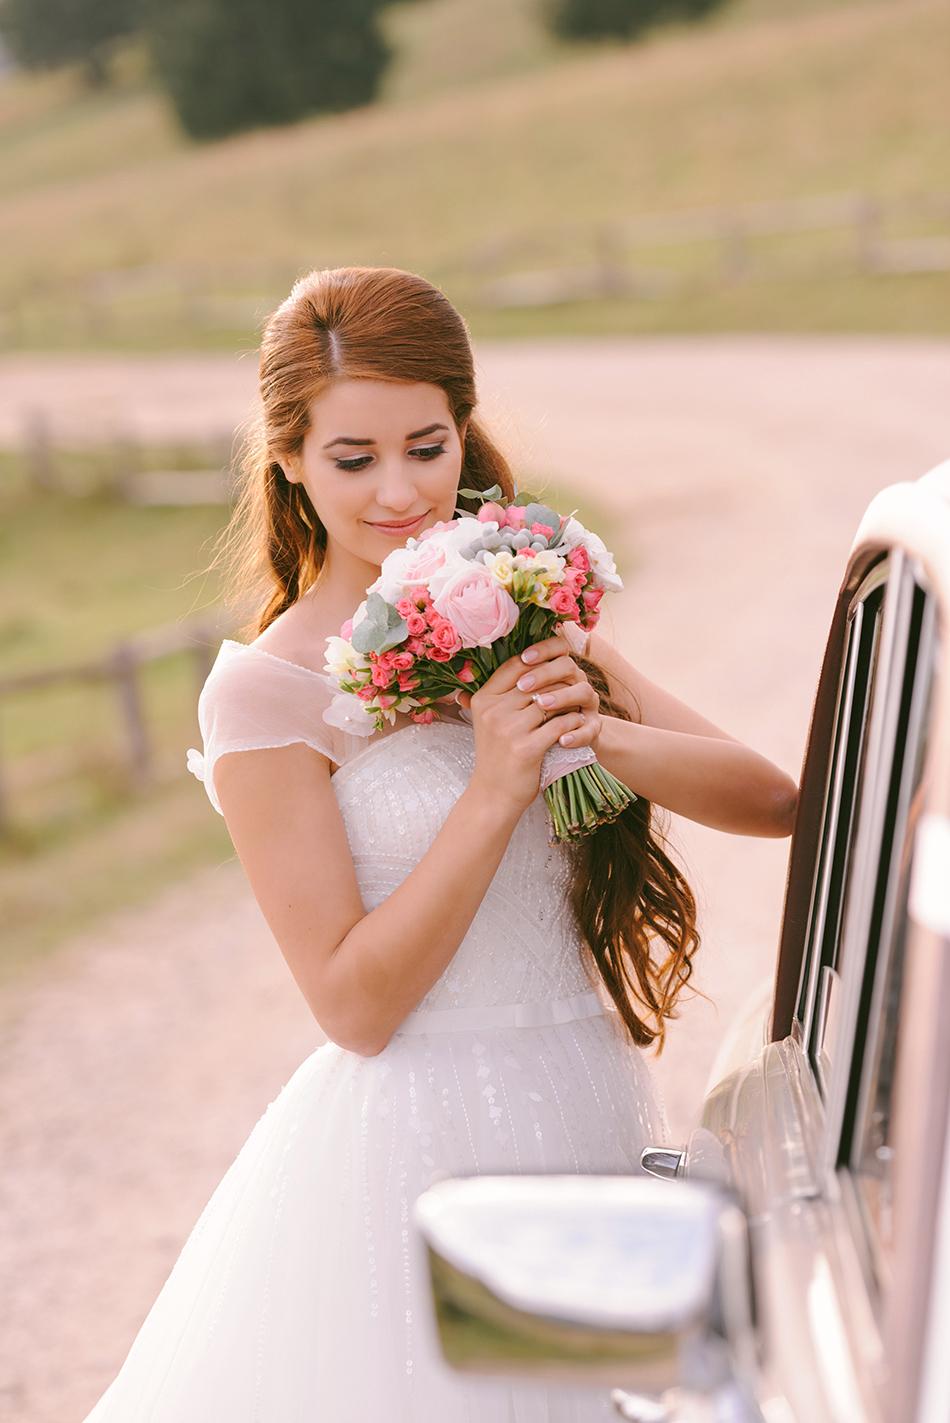 AD Passion Photography | fotograf-nunta-brasov-poiana-brasov-fotograf-profesionist_lorena-cristi_0145 | Adelin, Dida, fotograf profesionist, fotograf de nunta, fotografie de nunta, fotograf Timisoara, fotograf Craiova, fotograf Bucuresti, fotograf Arad, nunta Timisoara, nunta Arad, nunta Bucuresti, nunta Craiova